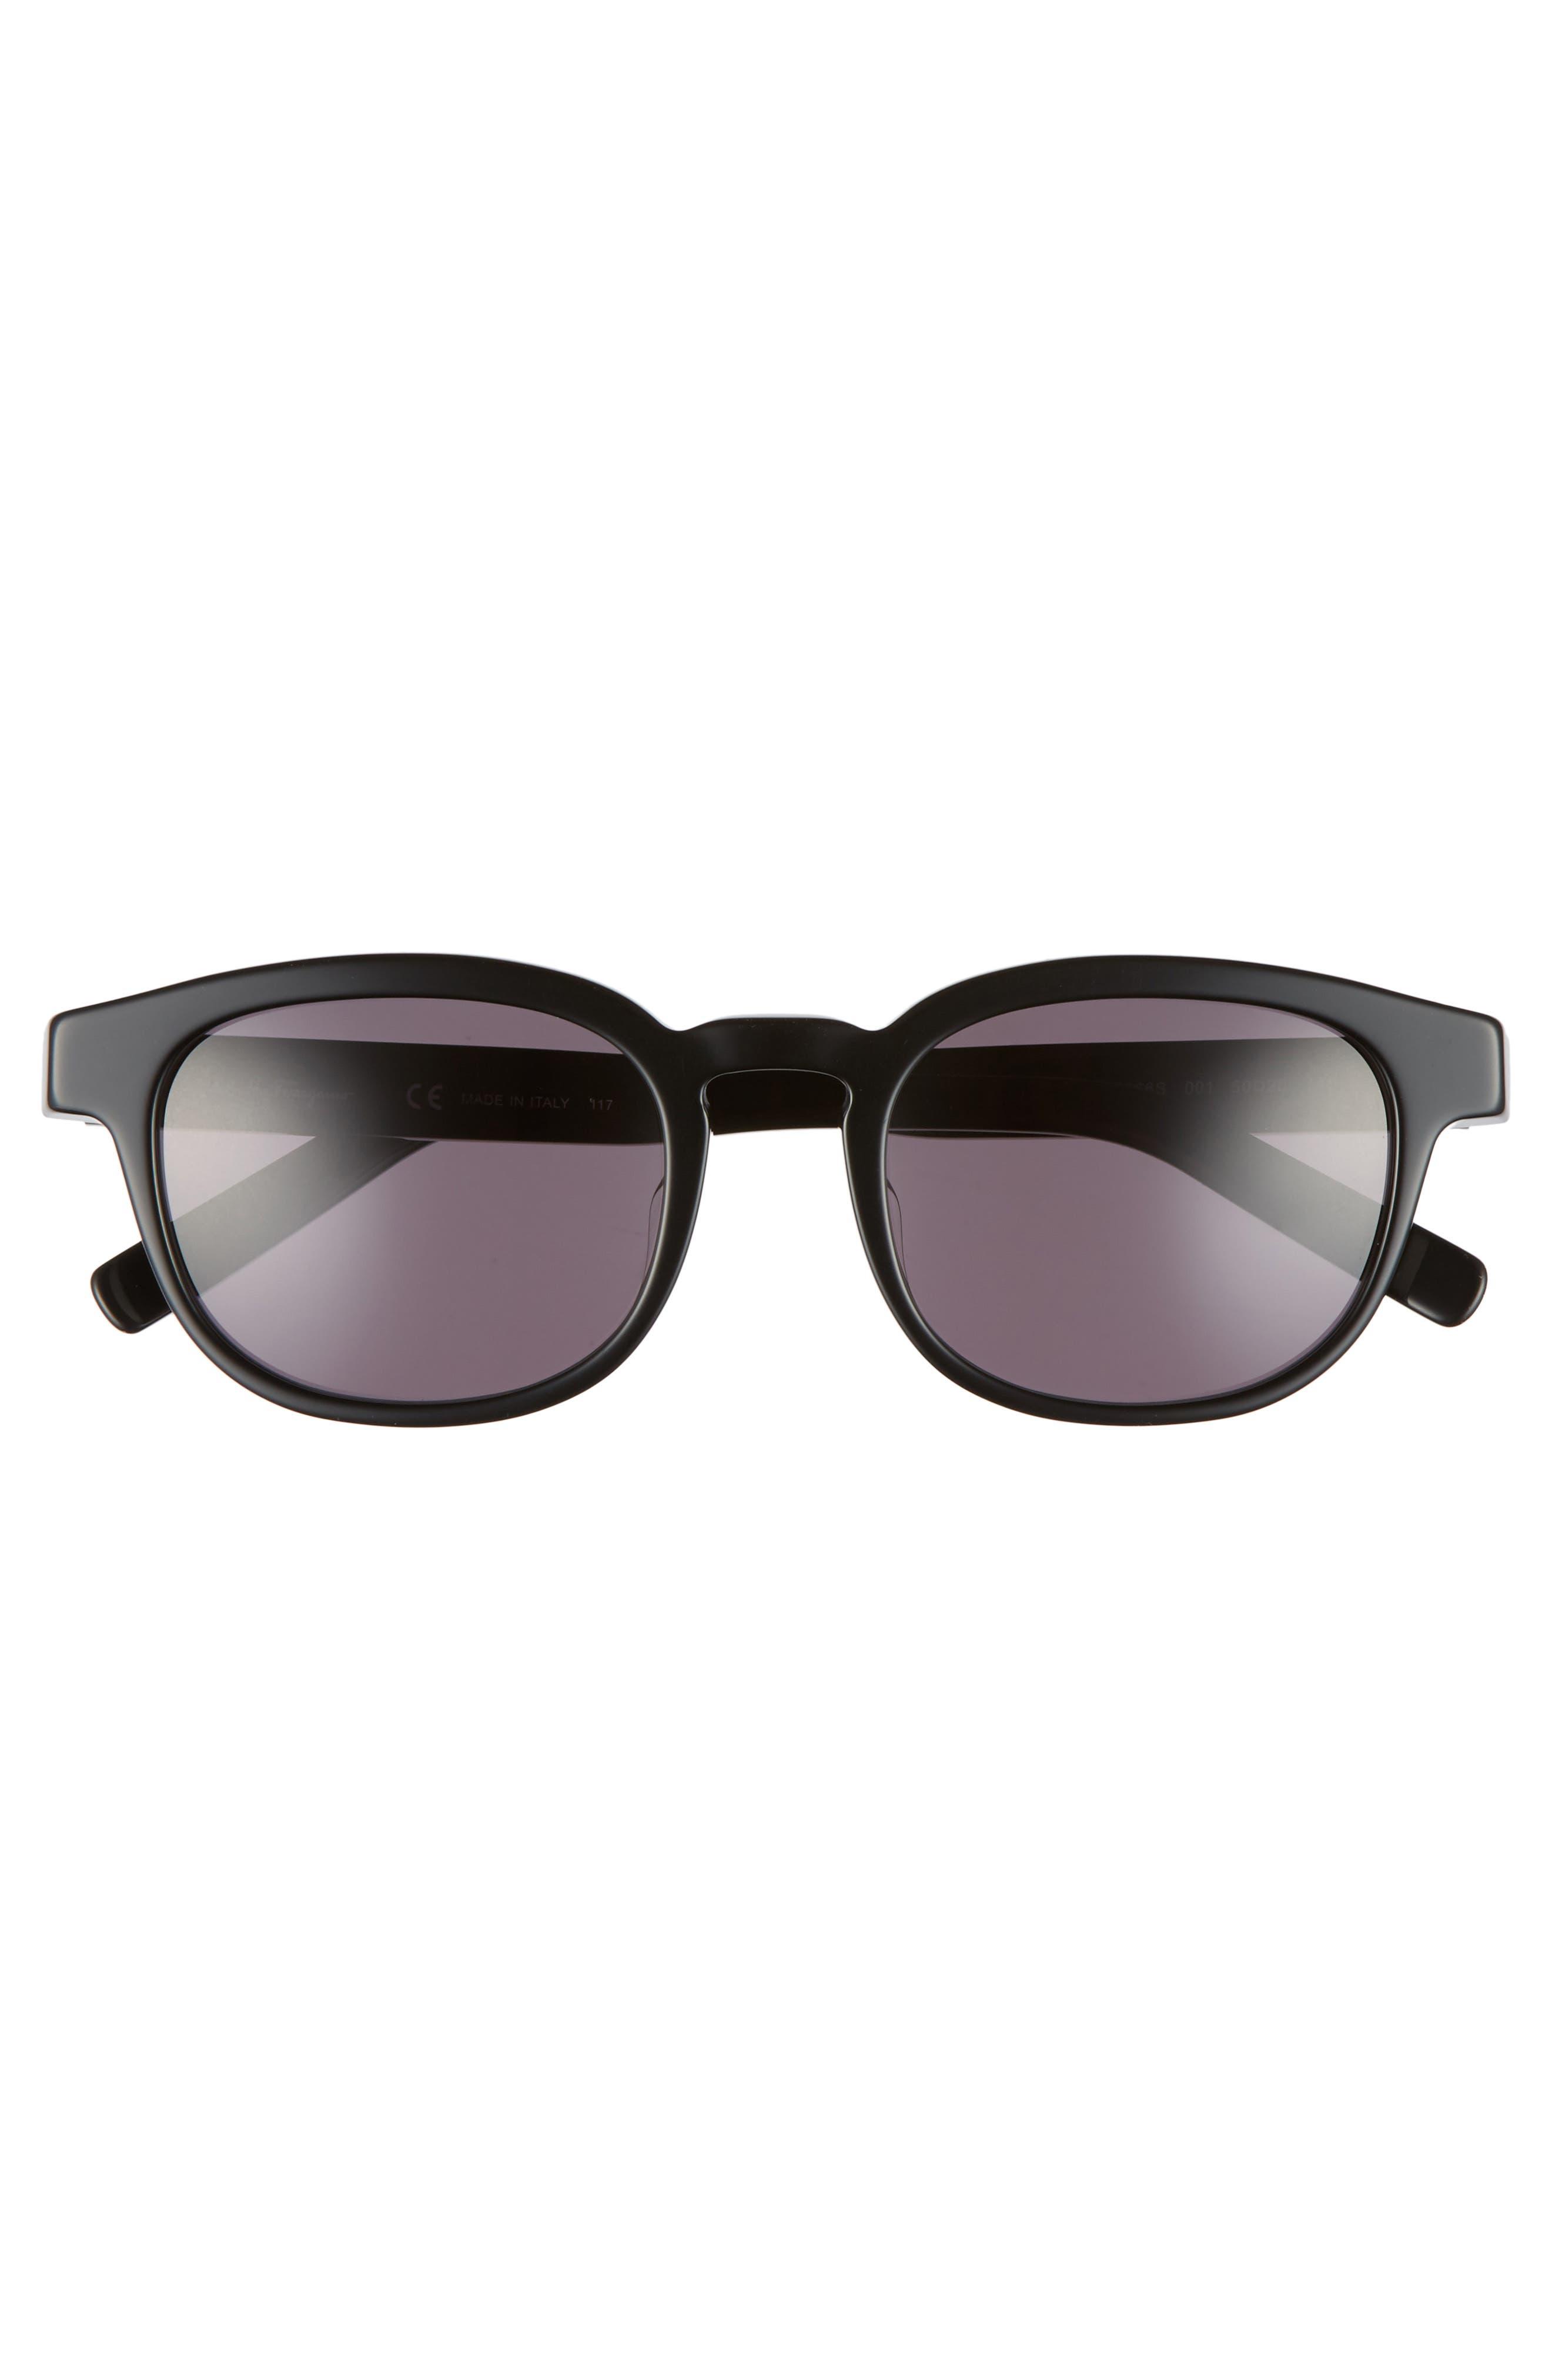 866S 50mm Sunglasses,                             Alternate thumbnail 2, color,                             BLACK